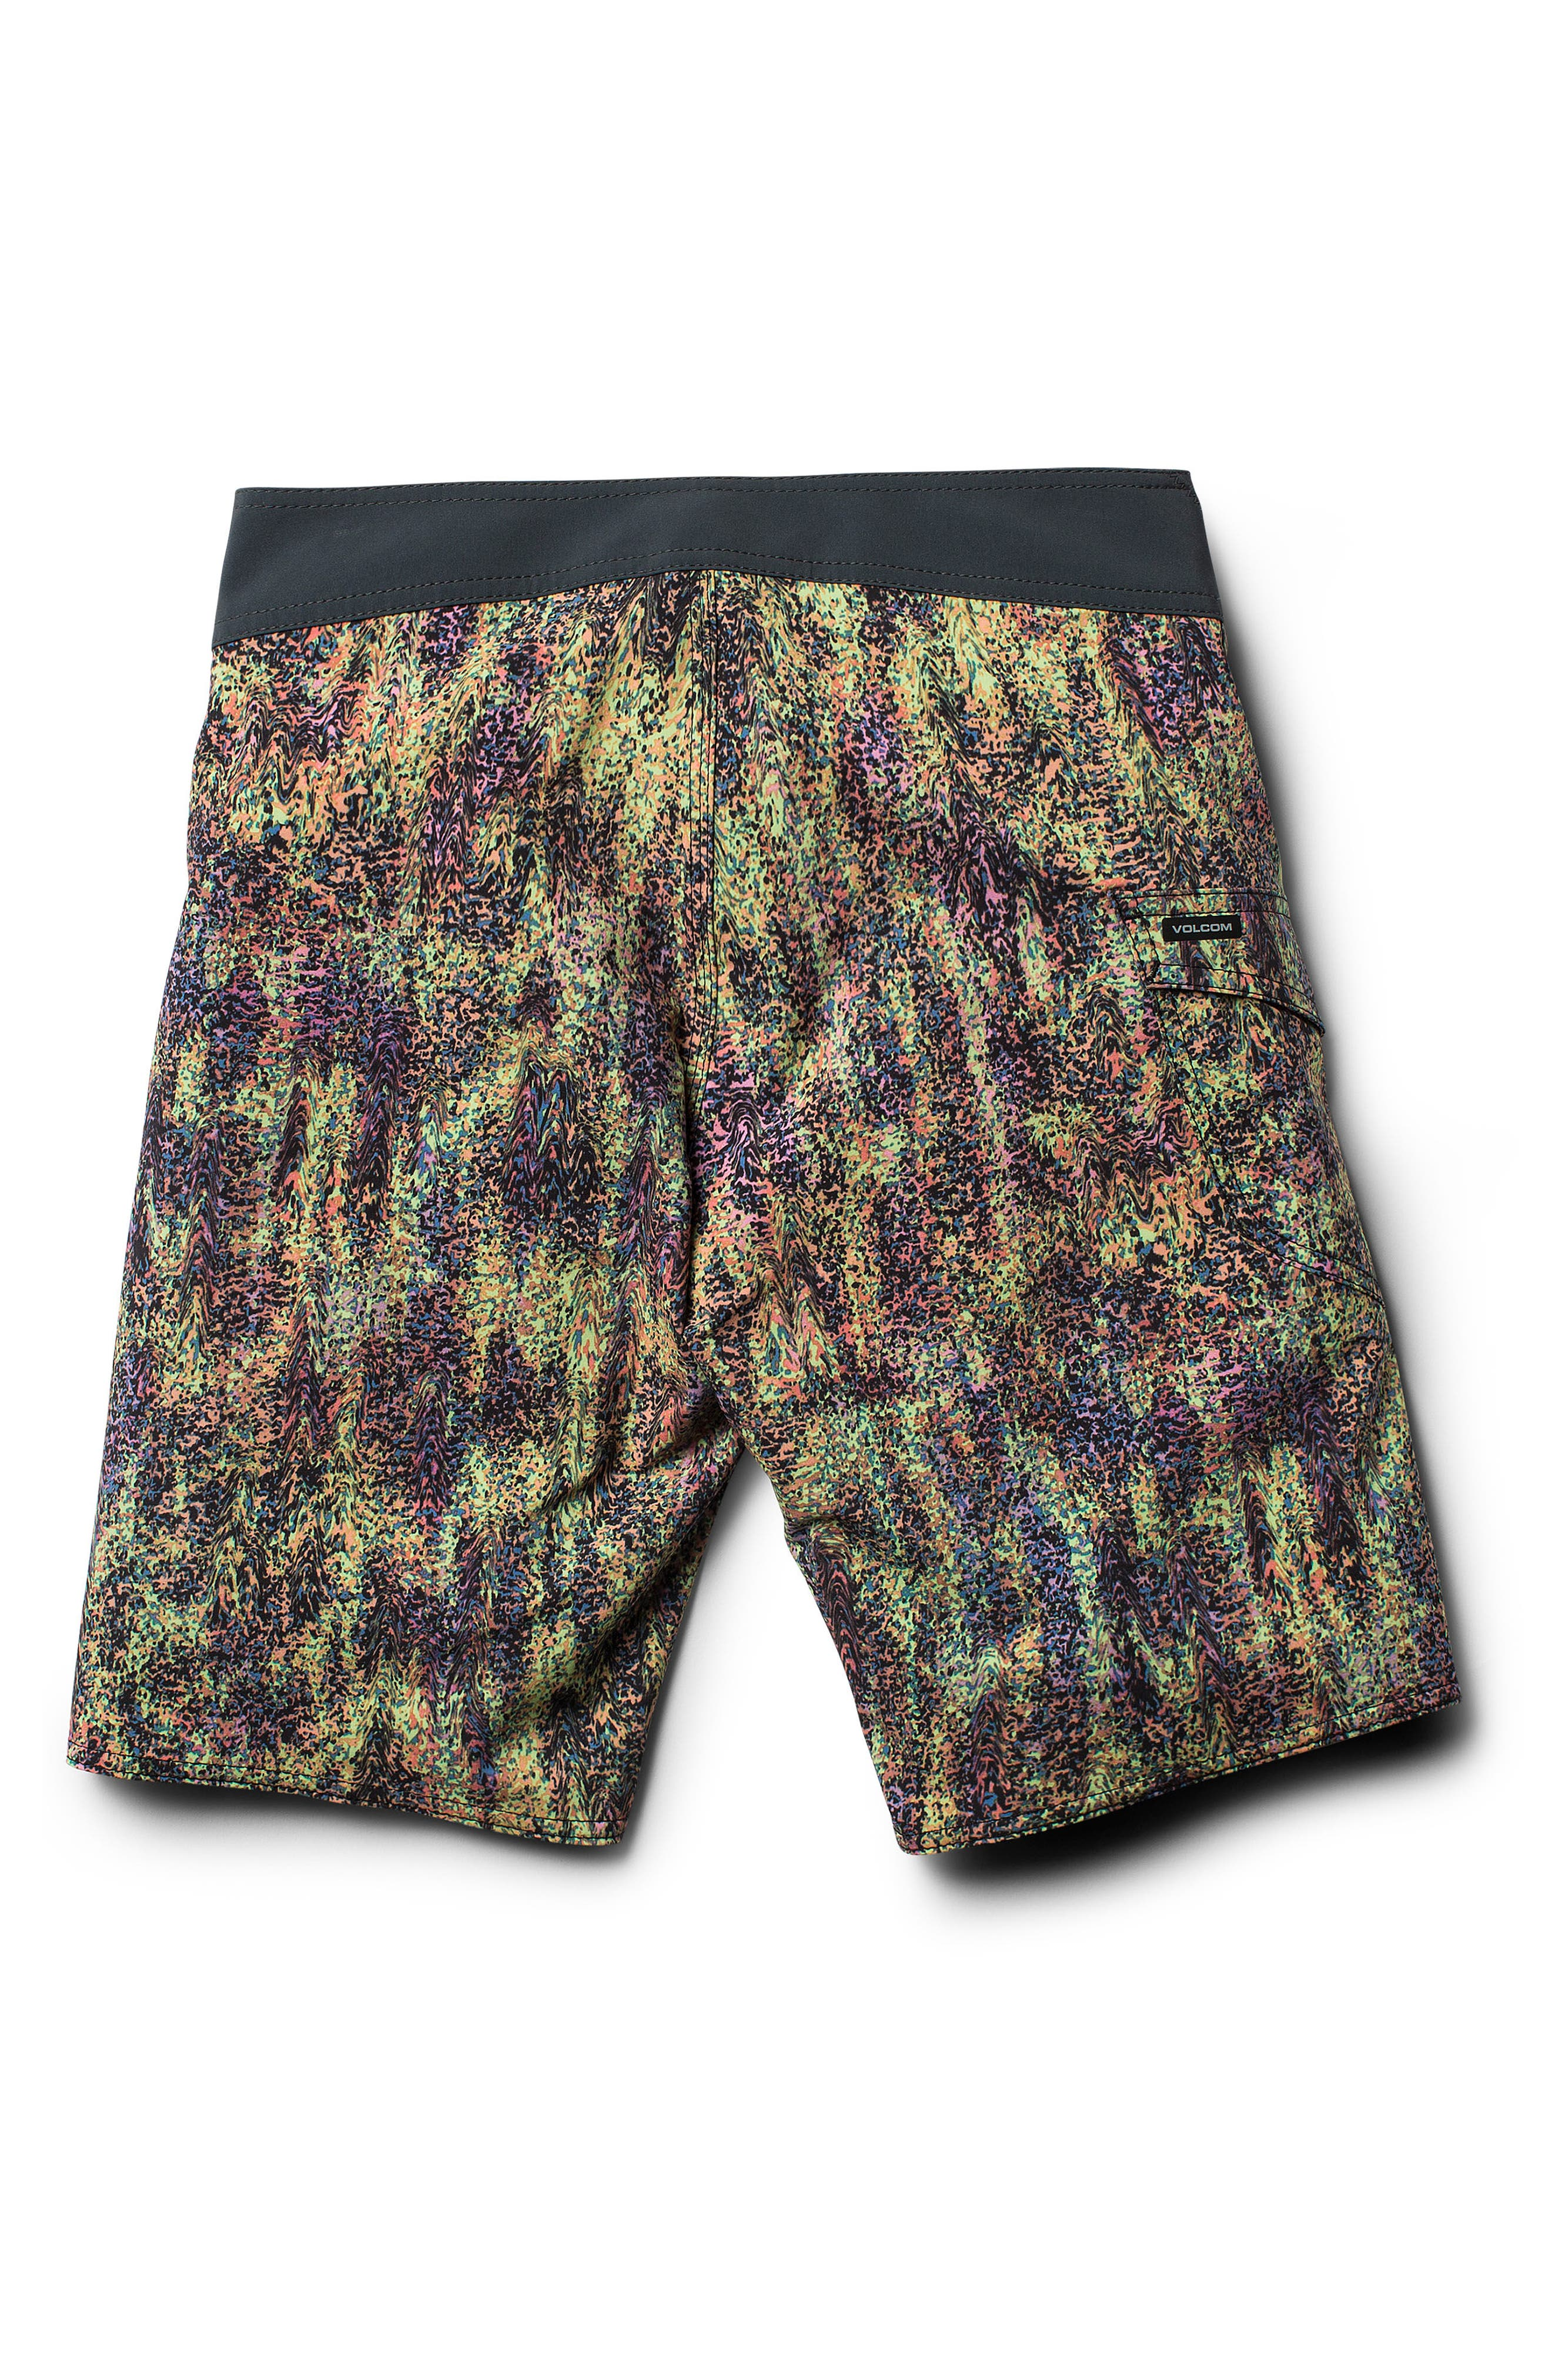 Plasm Mod Board Shorts,                             Alternate thumbnail 2, color,                             020